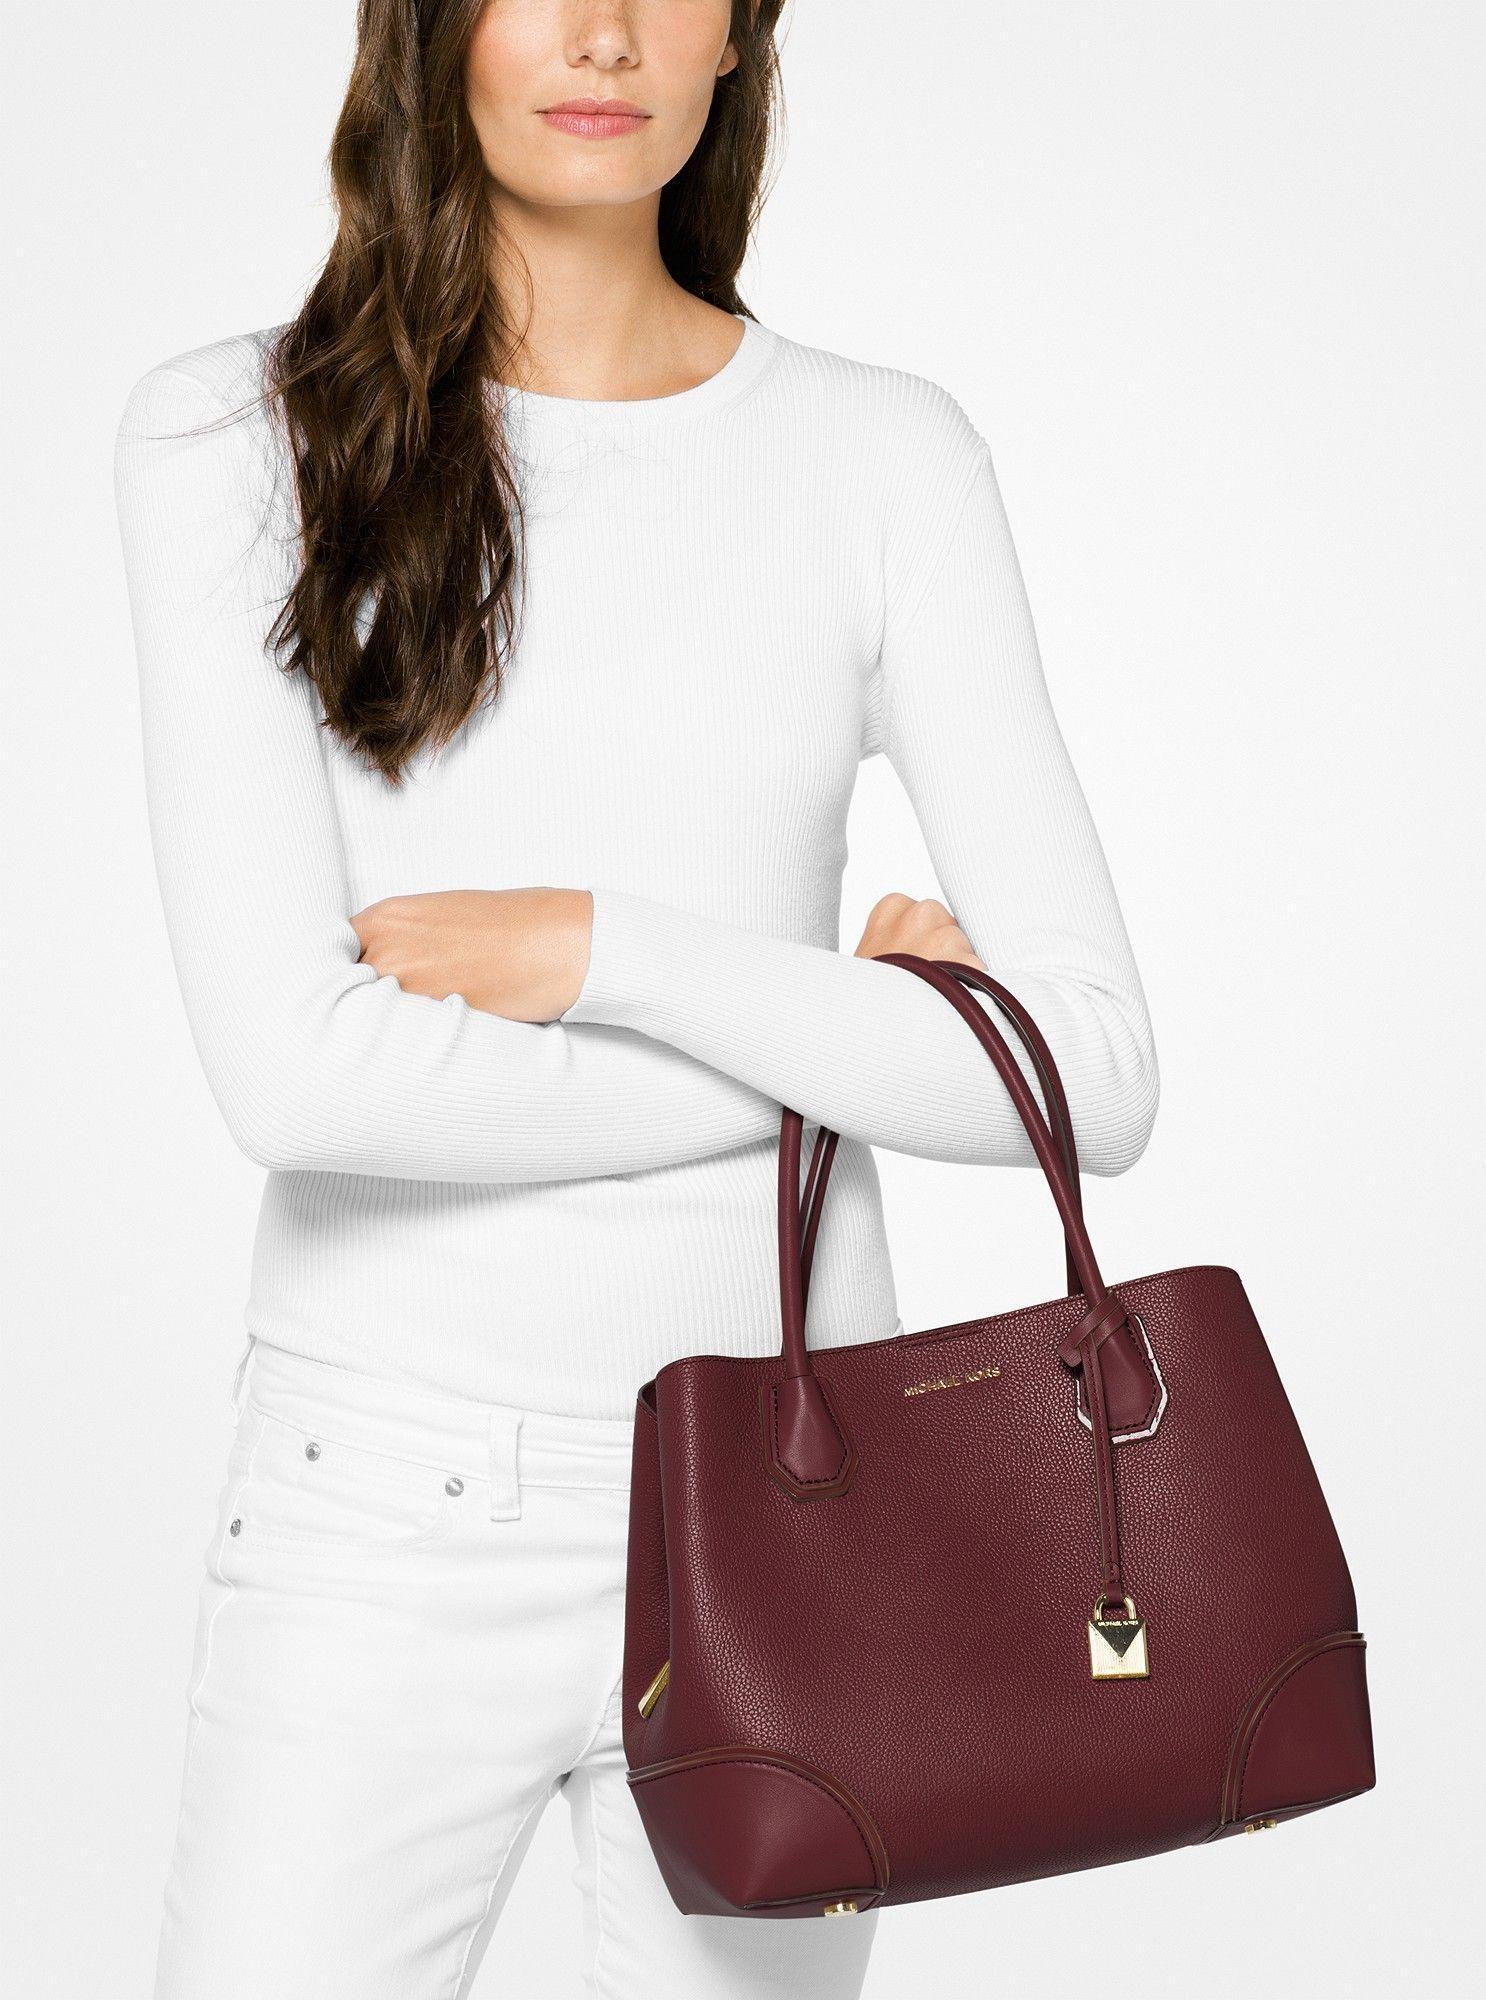 1cde3673a816 Michael Kors Mercer Gallery Medium Leather Satchel - Oxblood  #Handbagsmichaelkors